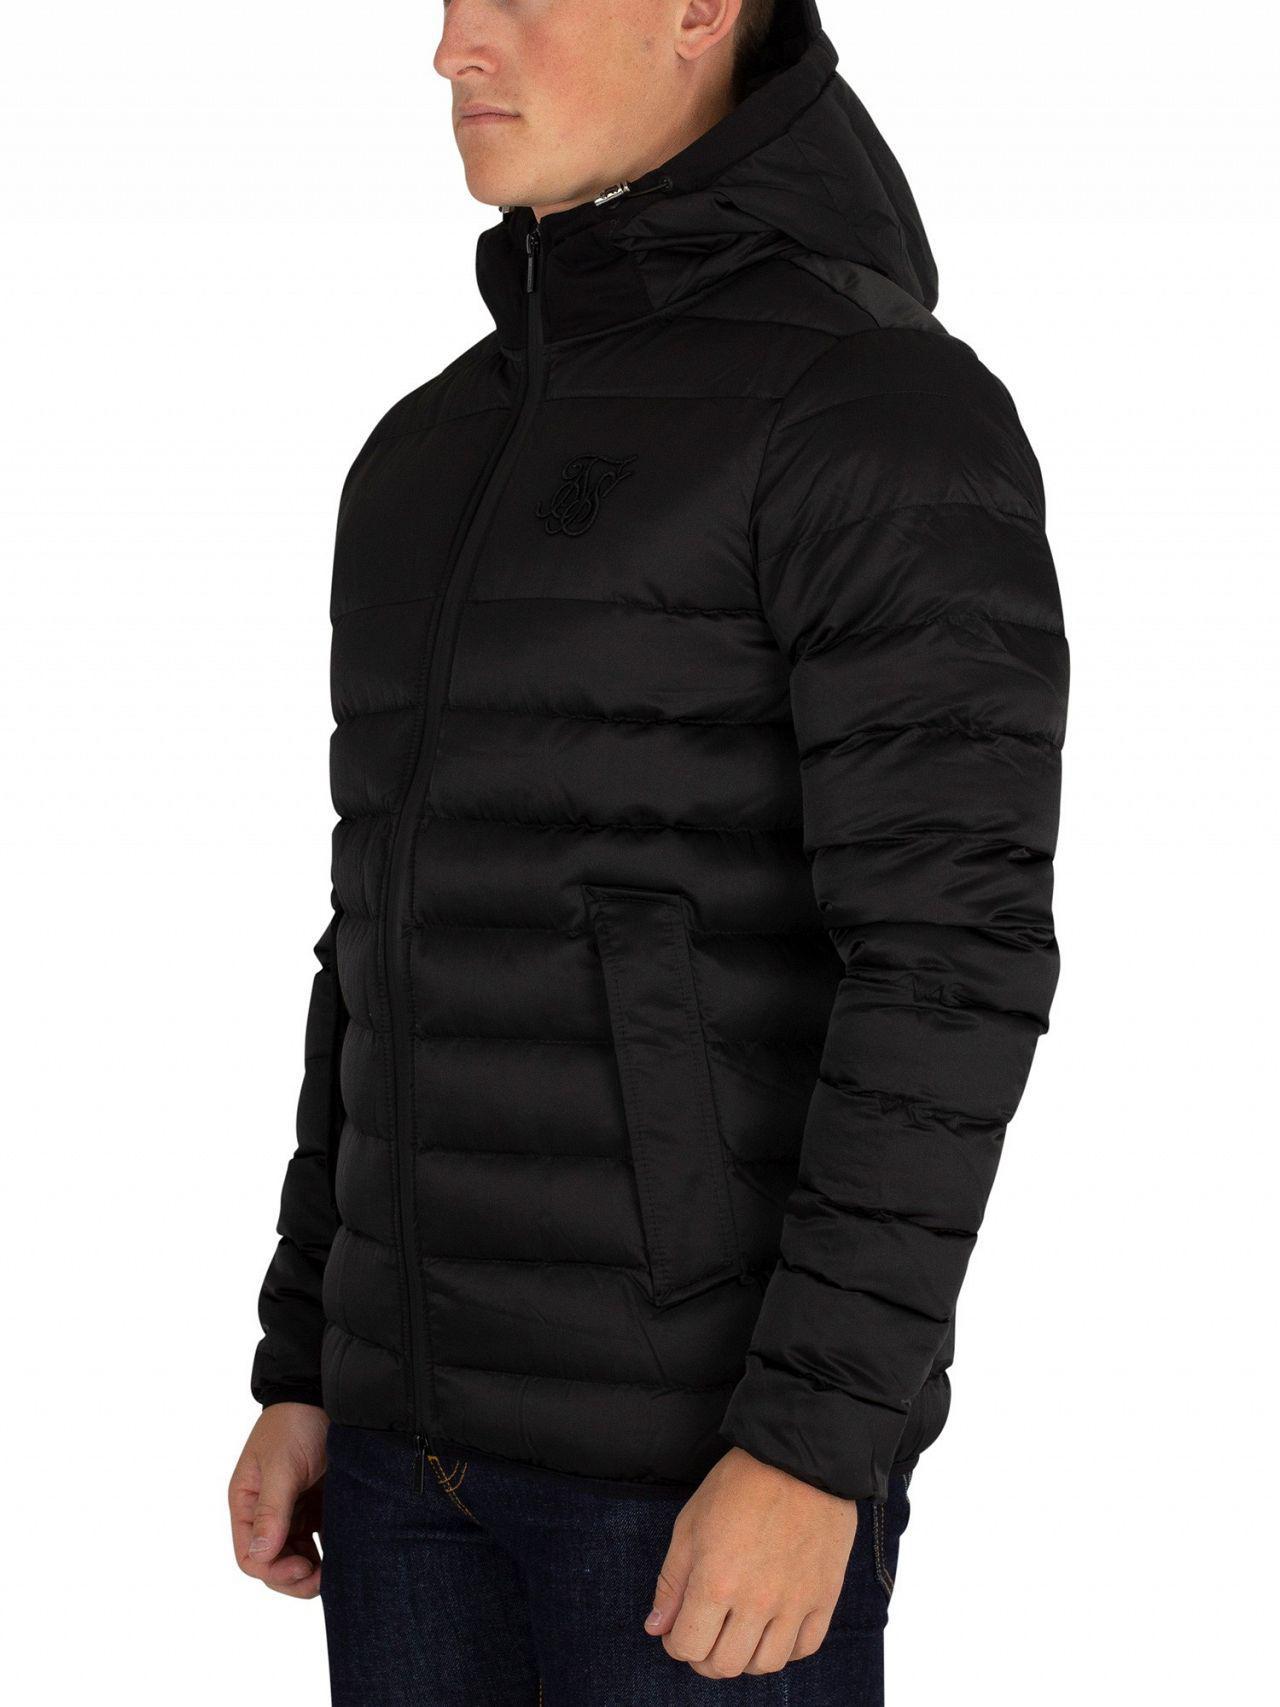 Sik Silk Men s Target Jacket, Black Men s Jacket In Black in Black ... 49abd81020